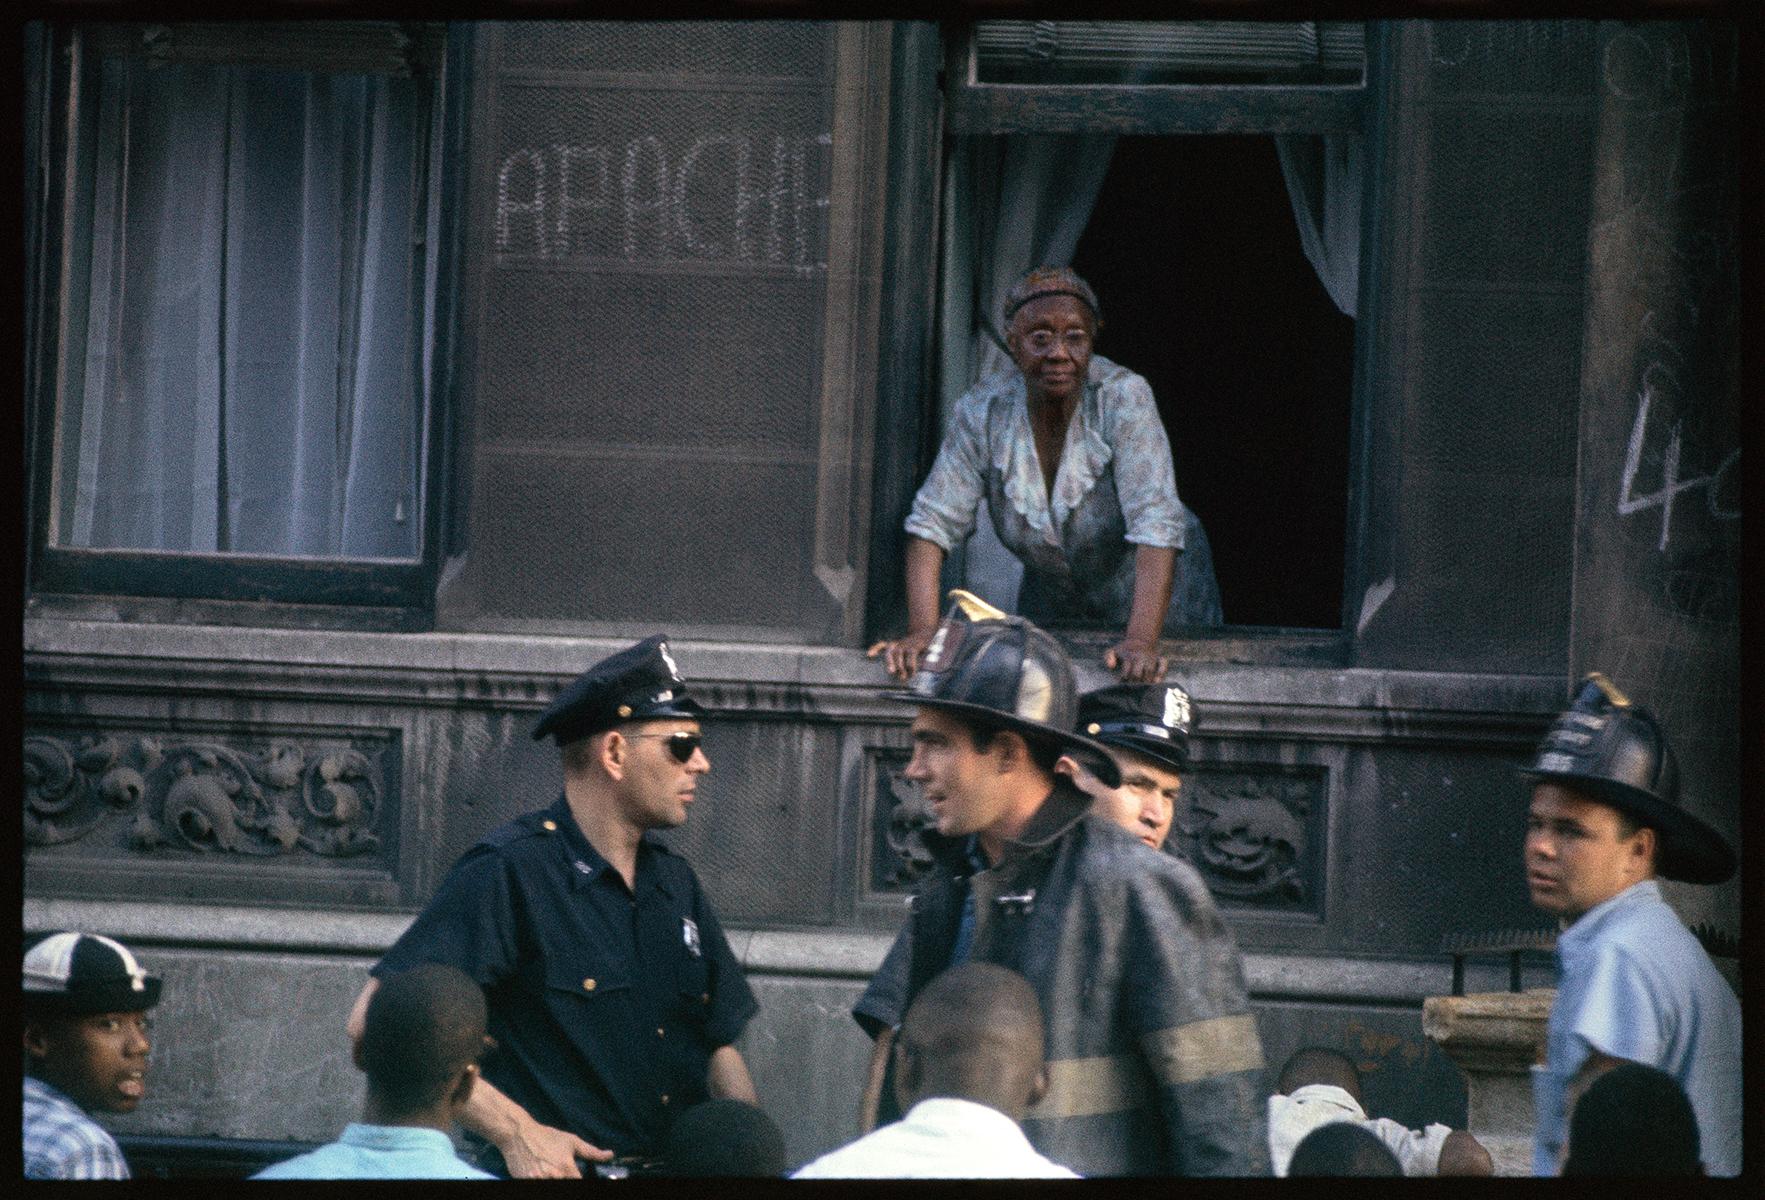 Gordon Parks, Neighbourhood of Gang Warfare, Harlem, New York, 1963, Archival pigment print. Courtesy of and copyright The Gordon Parks Foundation.